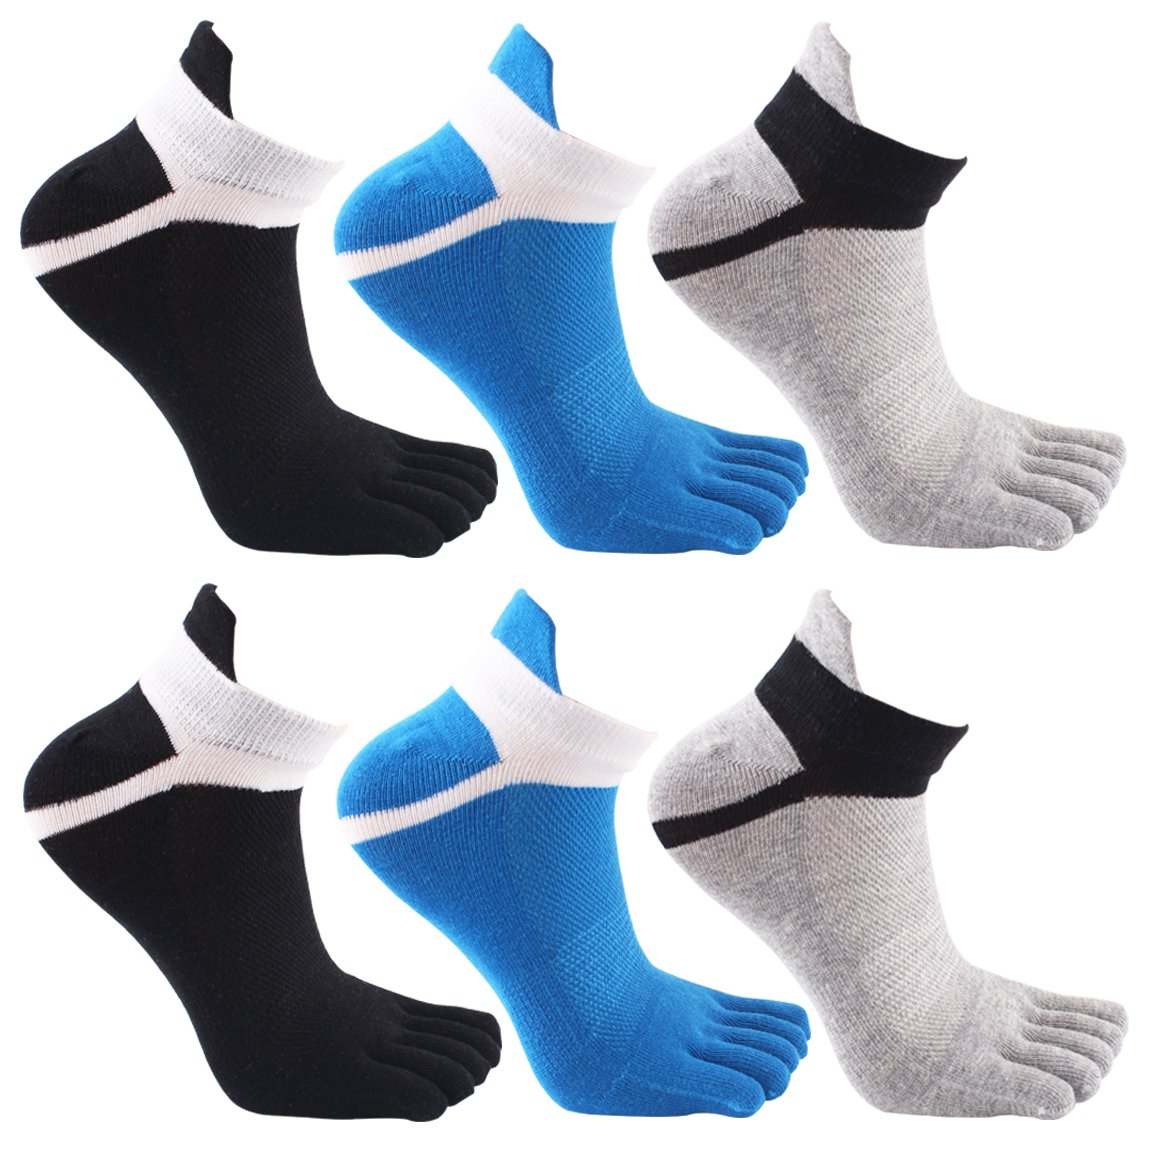 Mens Breathable Comfortable Toe Socks 6 Pairs Running Five Finger socks No Show Crew Socks for Men and women